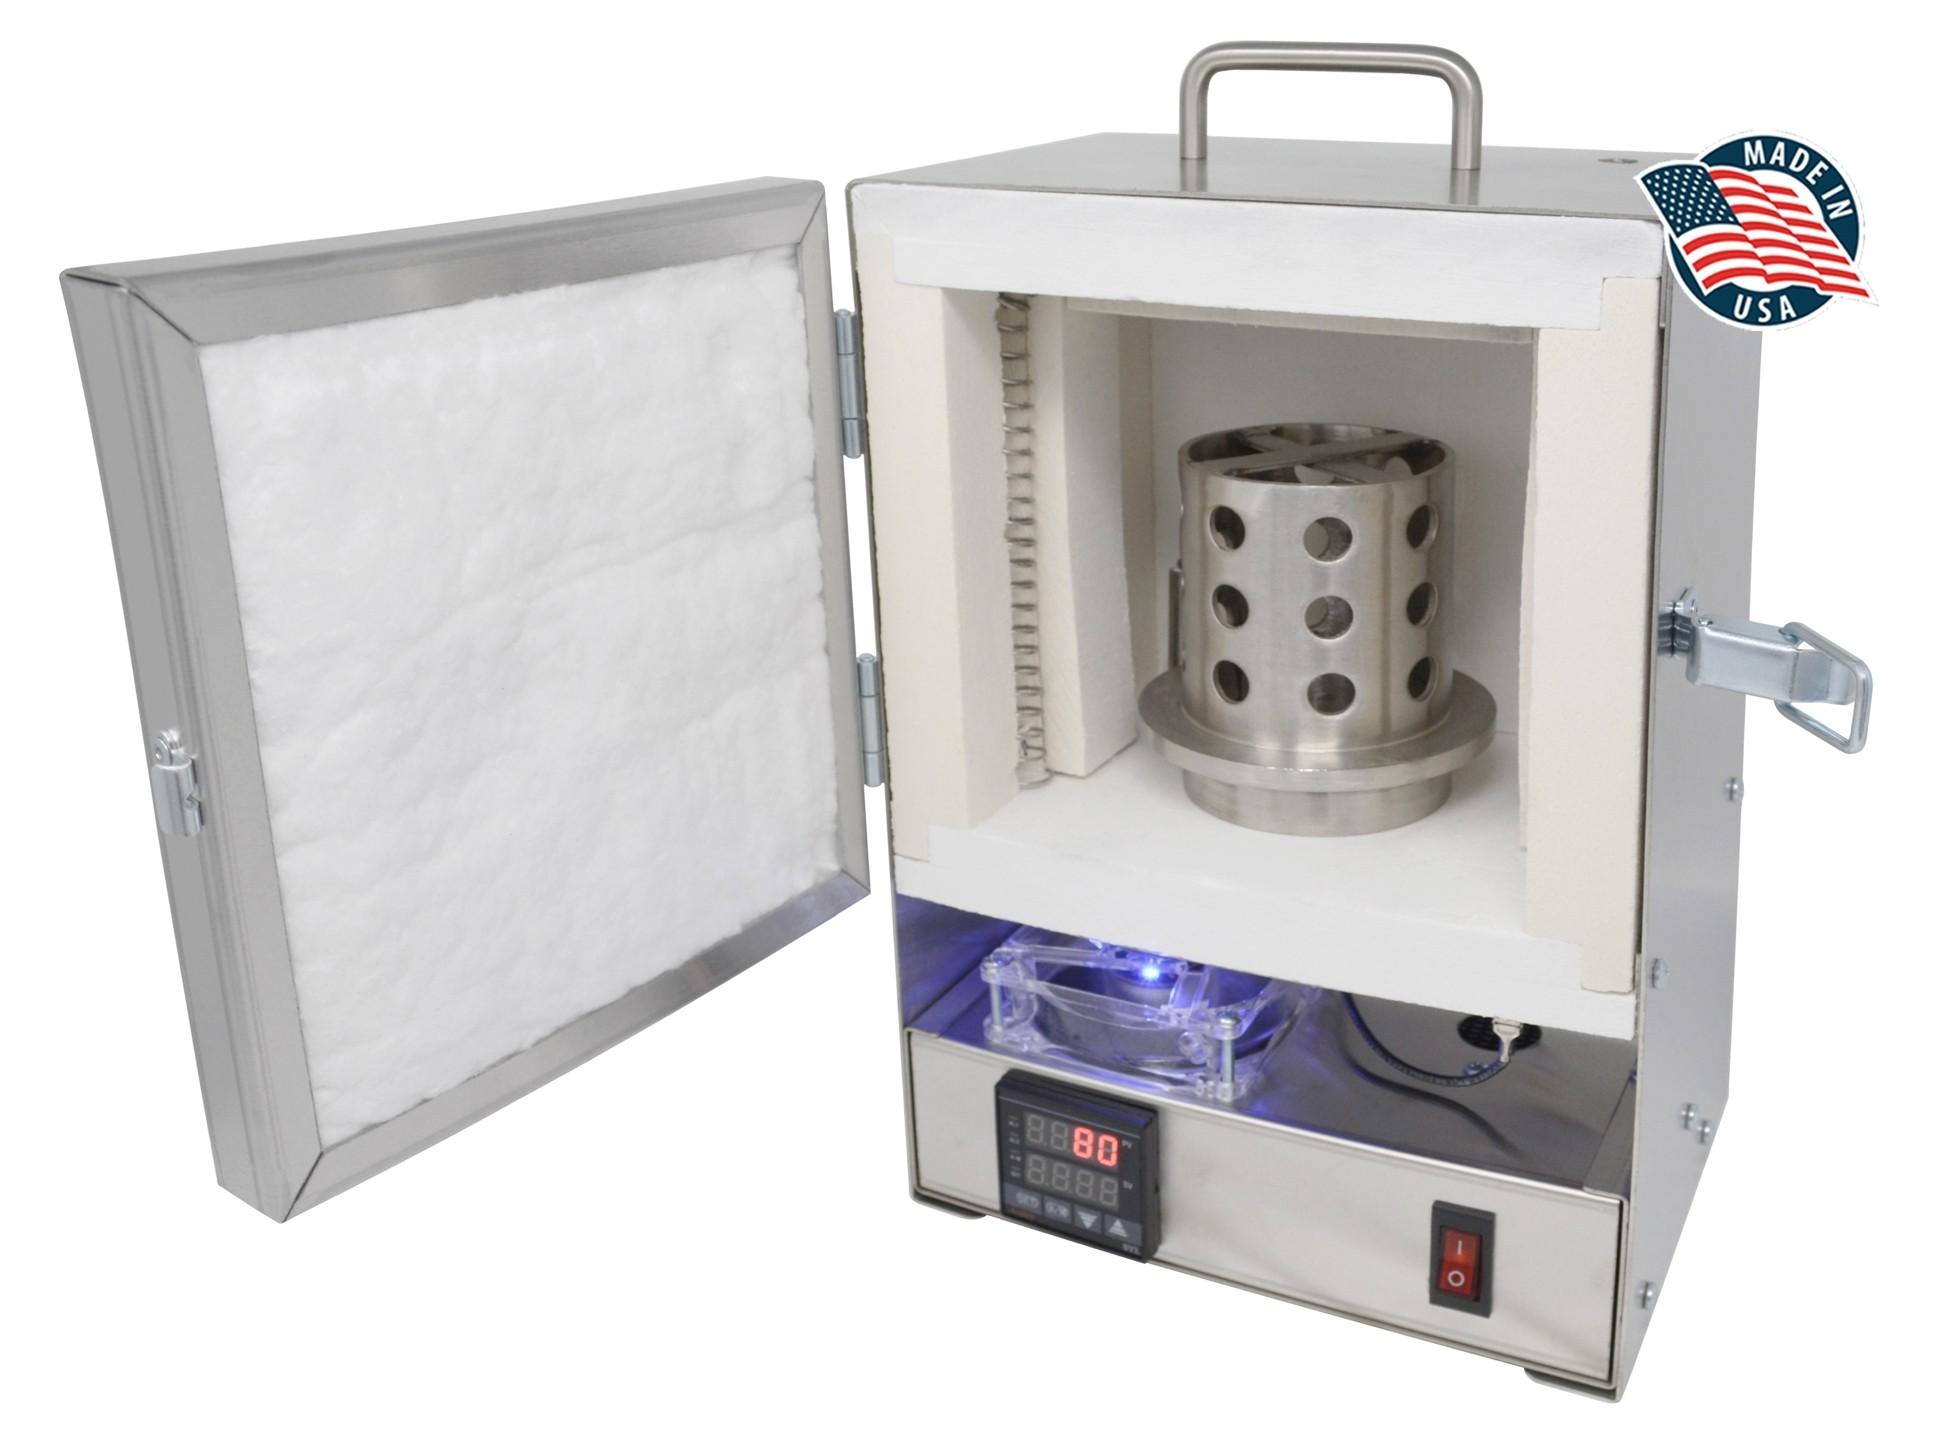 PROGRAMMABLE TableTop Hi Temp 2200°F Electric Burnout Oven Kiln For 3D PLA/